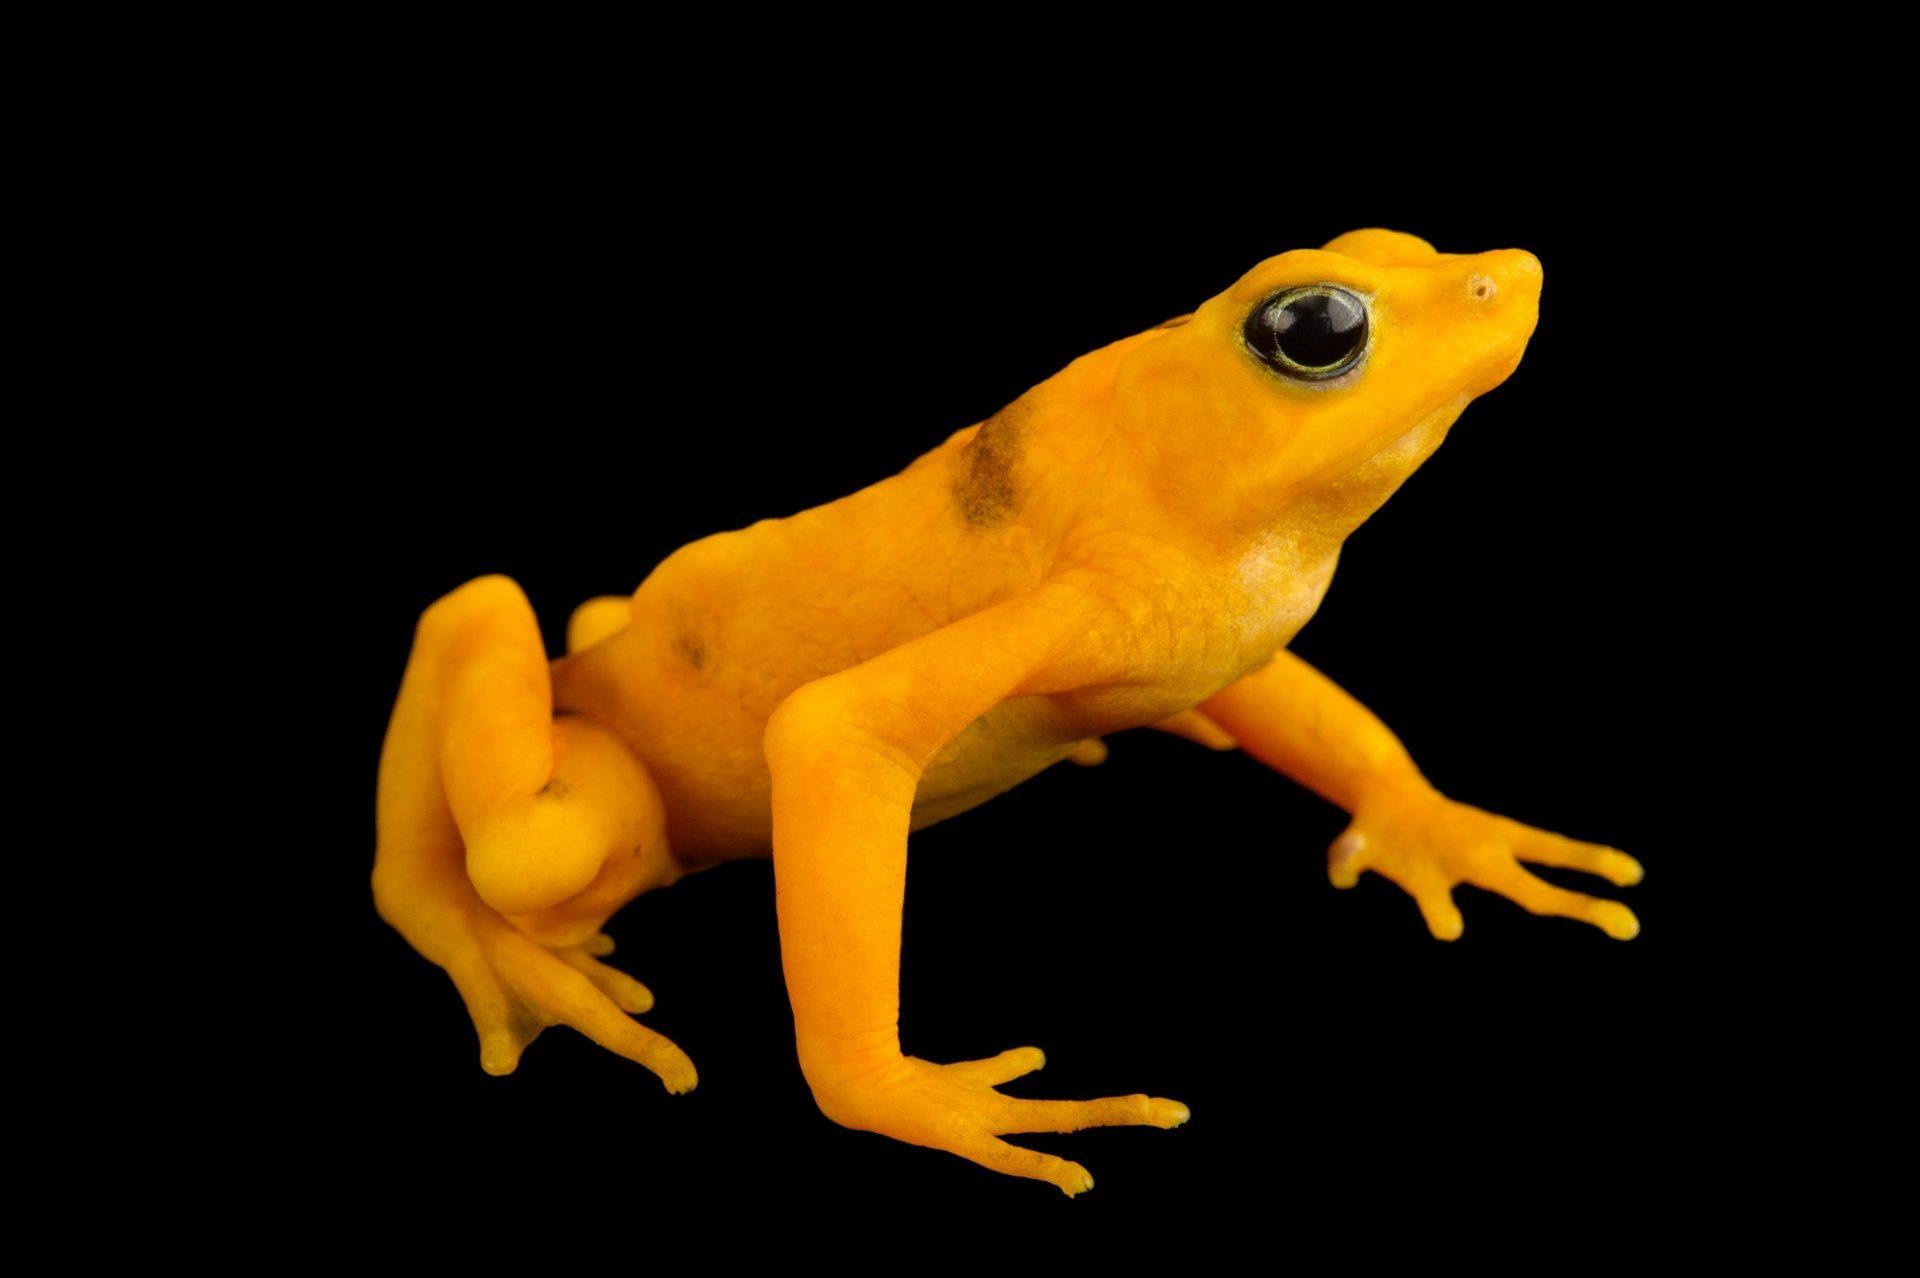 Critically endangered (IUCN) and federally endangered Panamanian golden frog (Atelopus zeteki) at the El Valle Amphibian Conservation Center (EVACC).